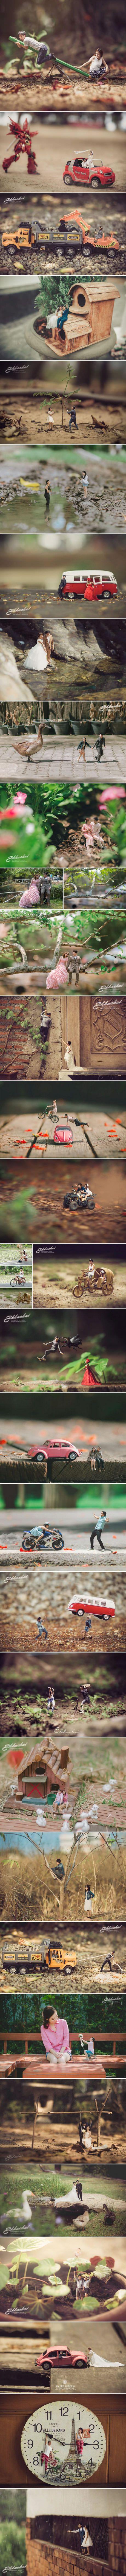 This wedding photographer turns couples into miniature people (Ekkachai Saelow)